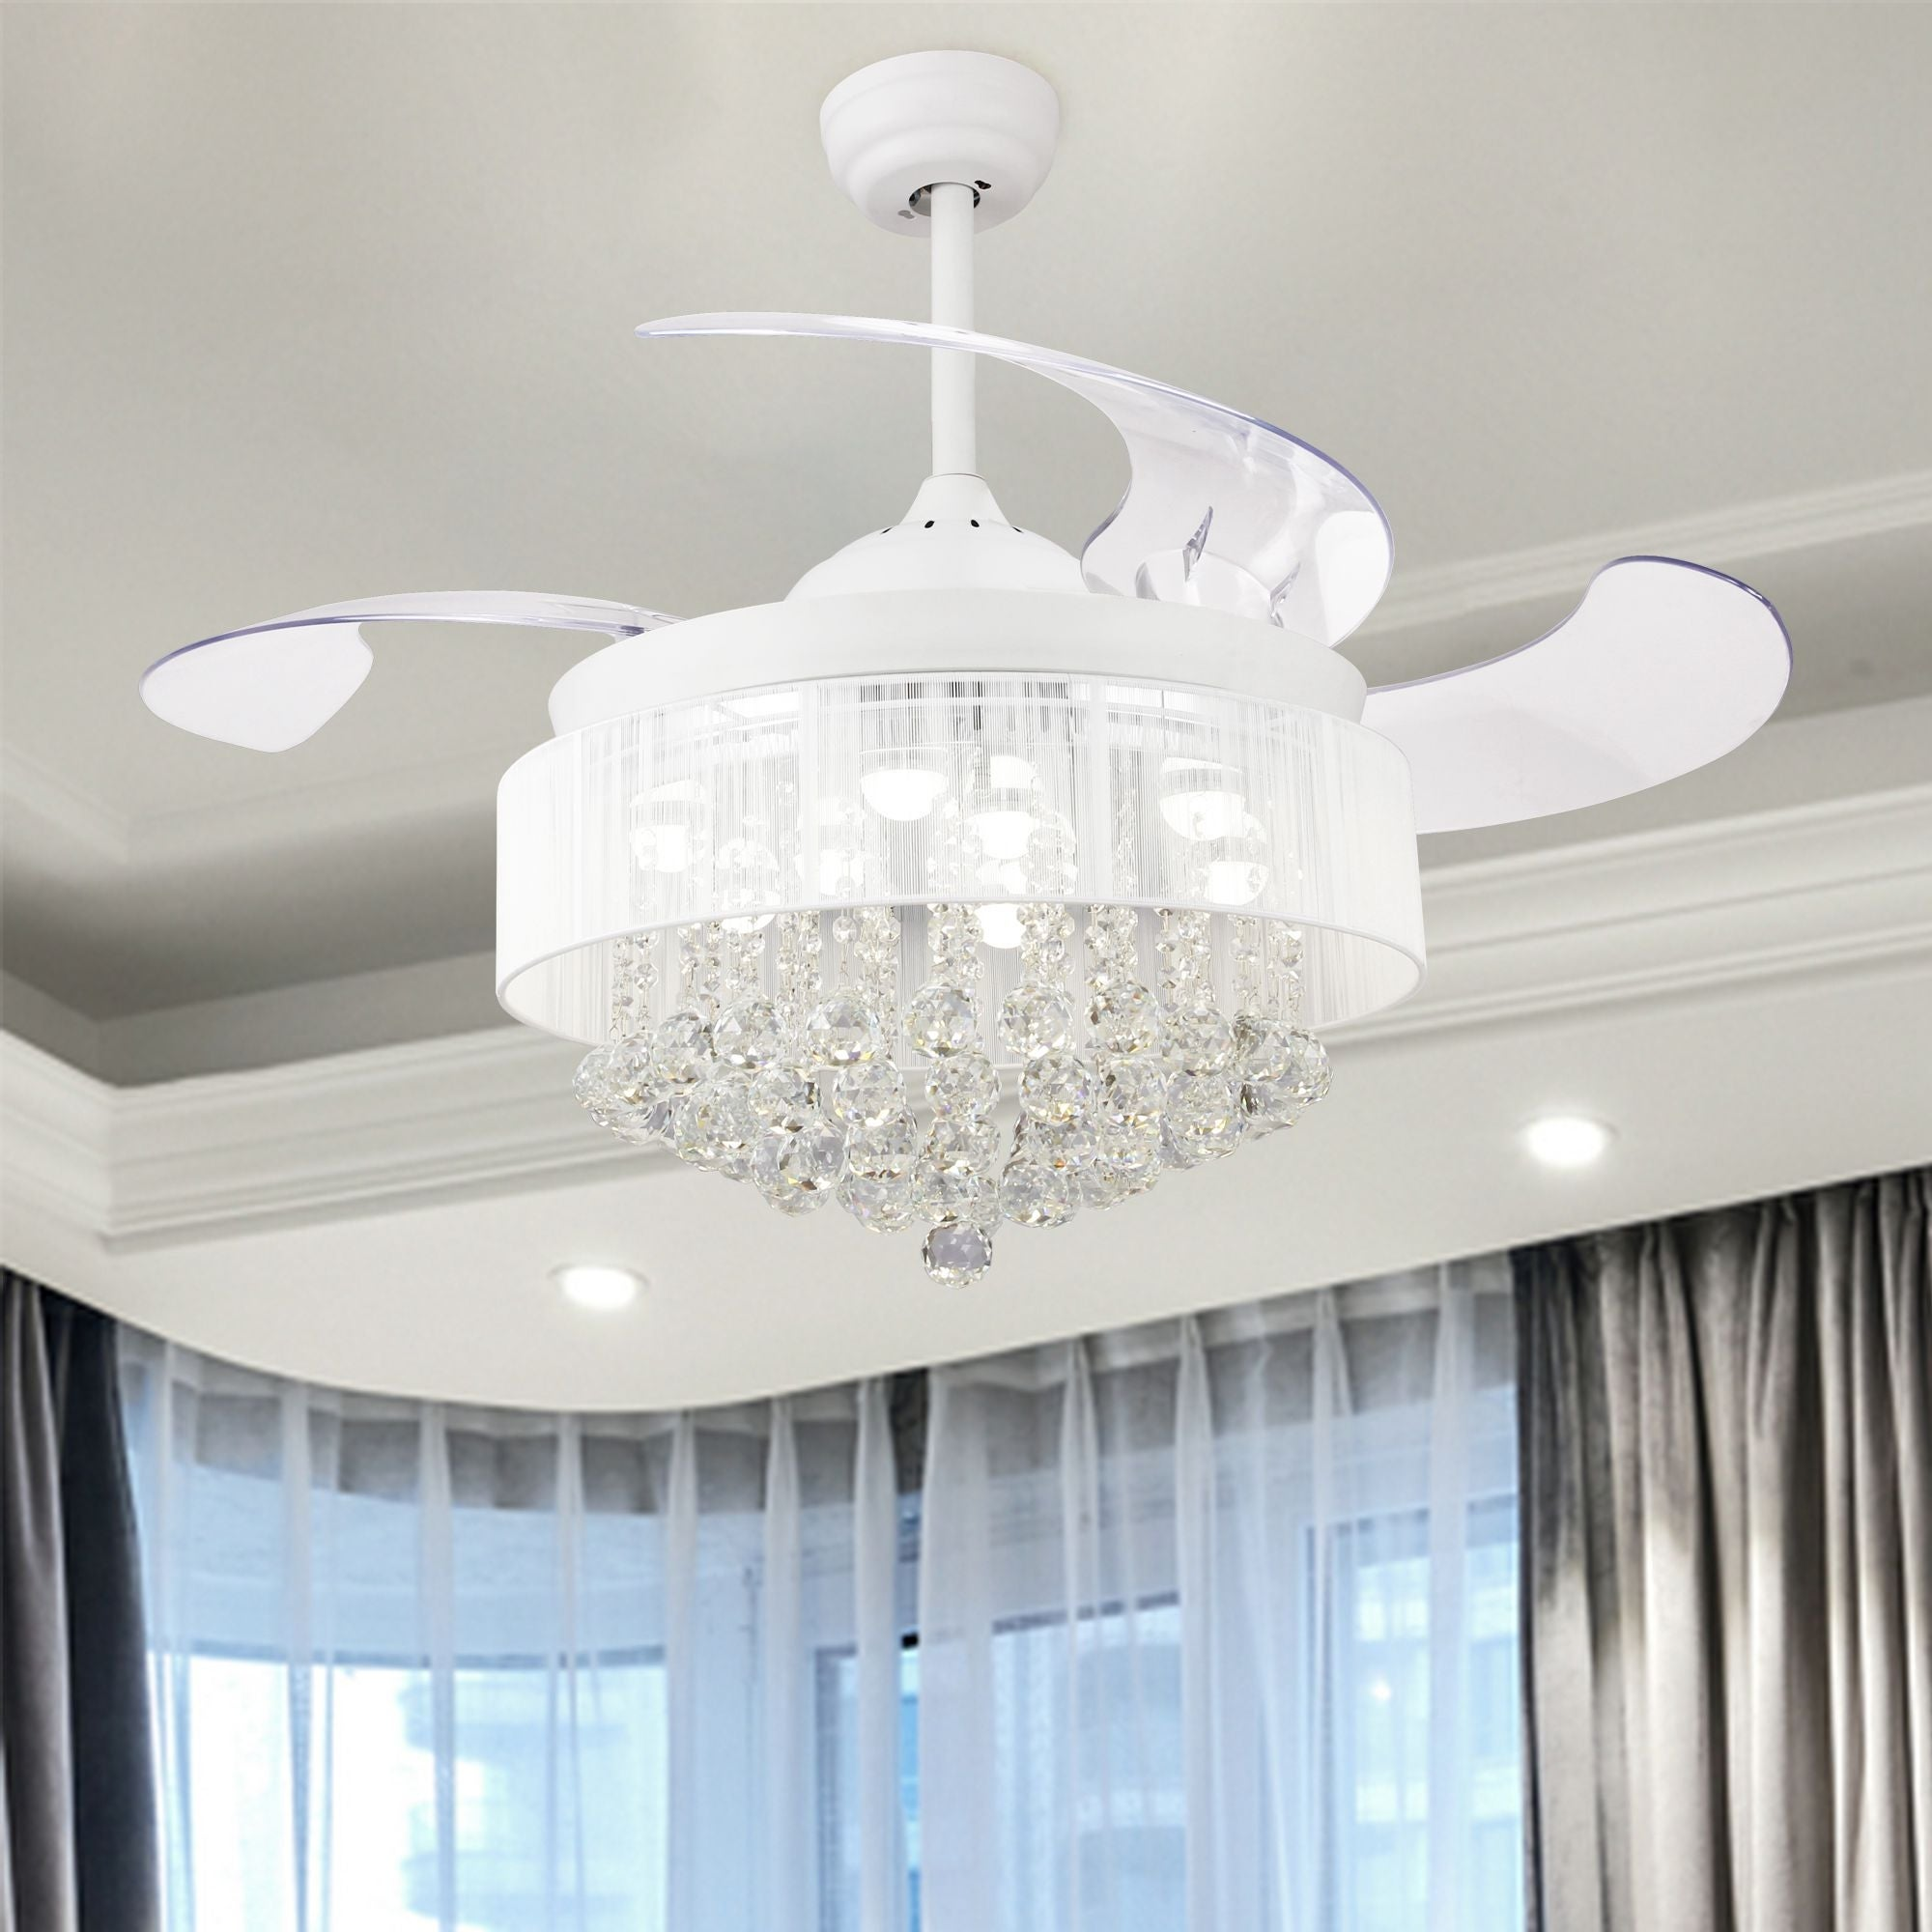 Buy Ceiling Fans Online at Overstock.com | Our Best Lighting Deals on painting bedroom ceilings, diy bedroom ceilings, decorating bedroom shelves, master bedroom ceilings, decorating bedroom walls, decorating bedroom furniture,